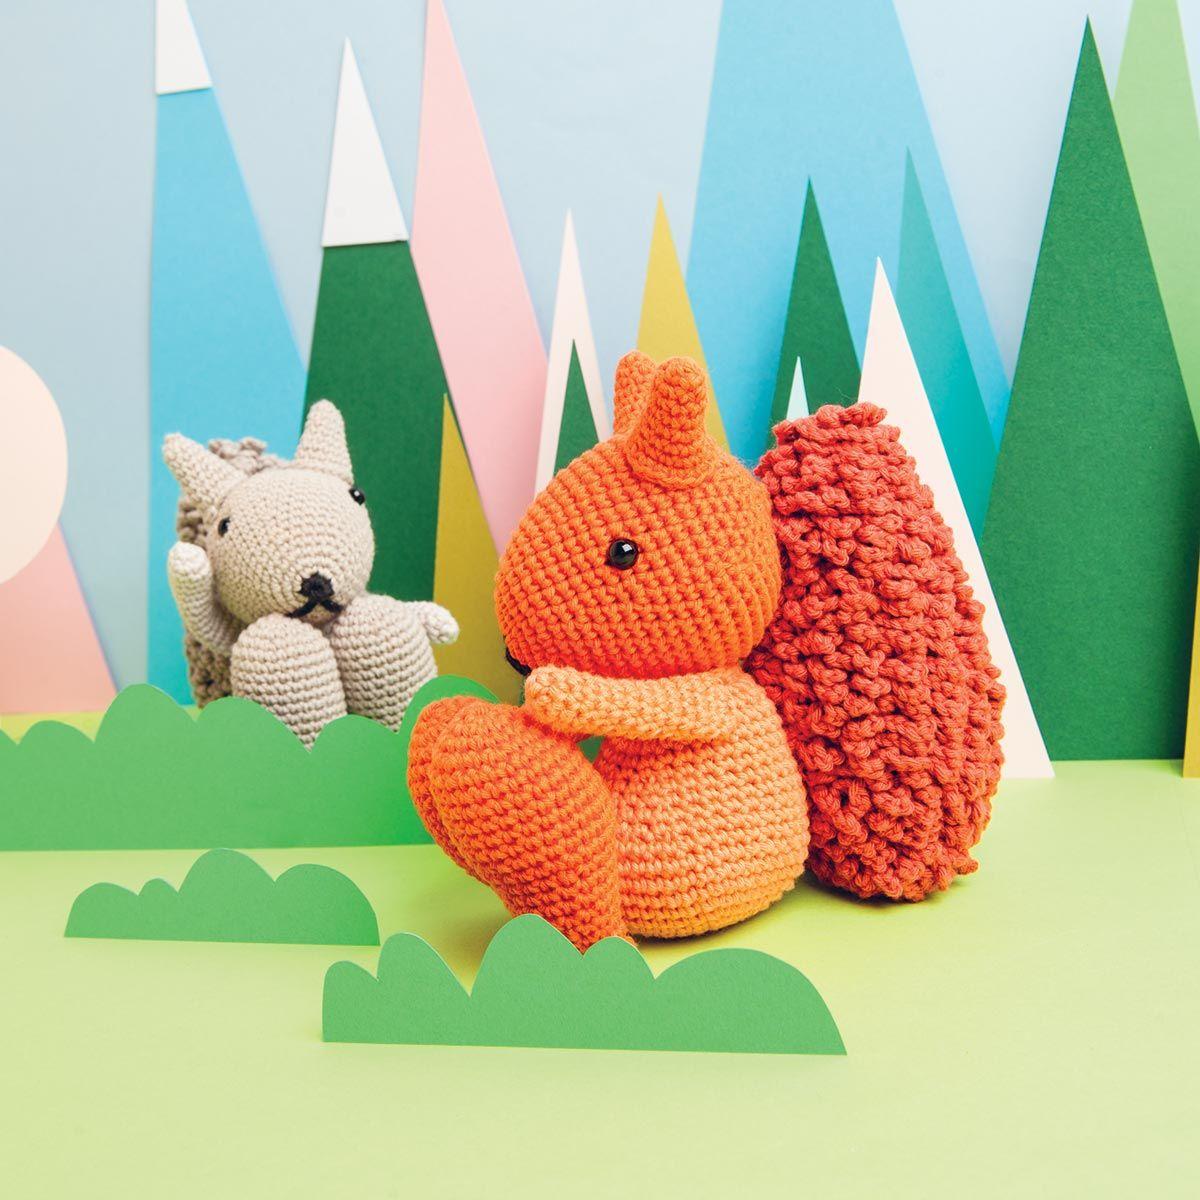 Kit crochet amigurumi - Ecureuil